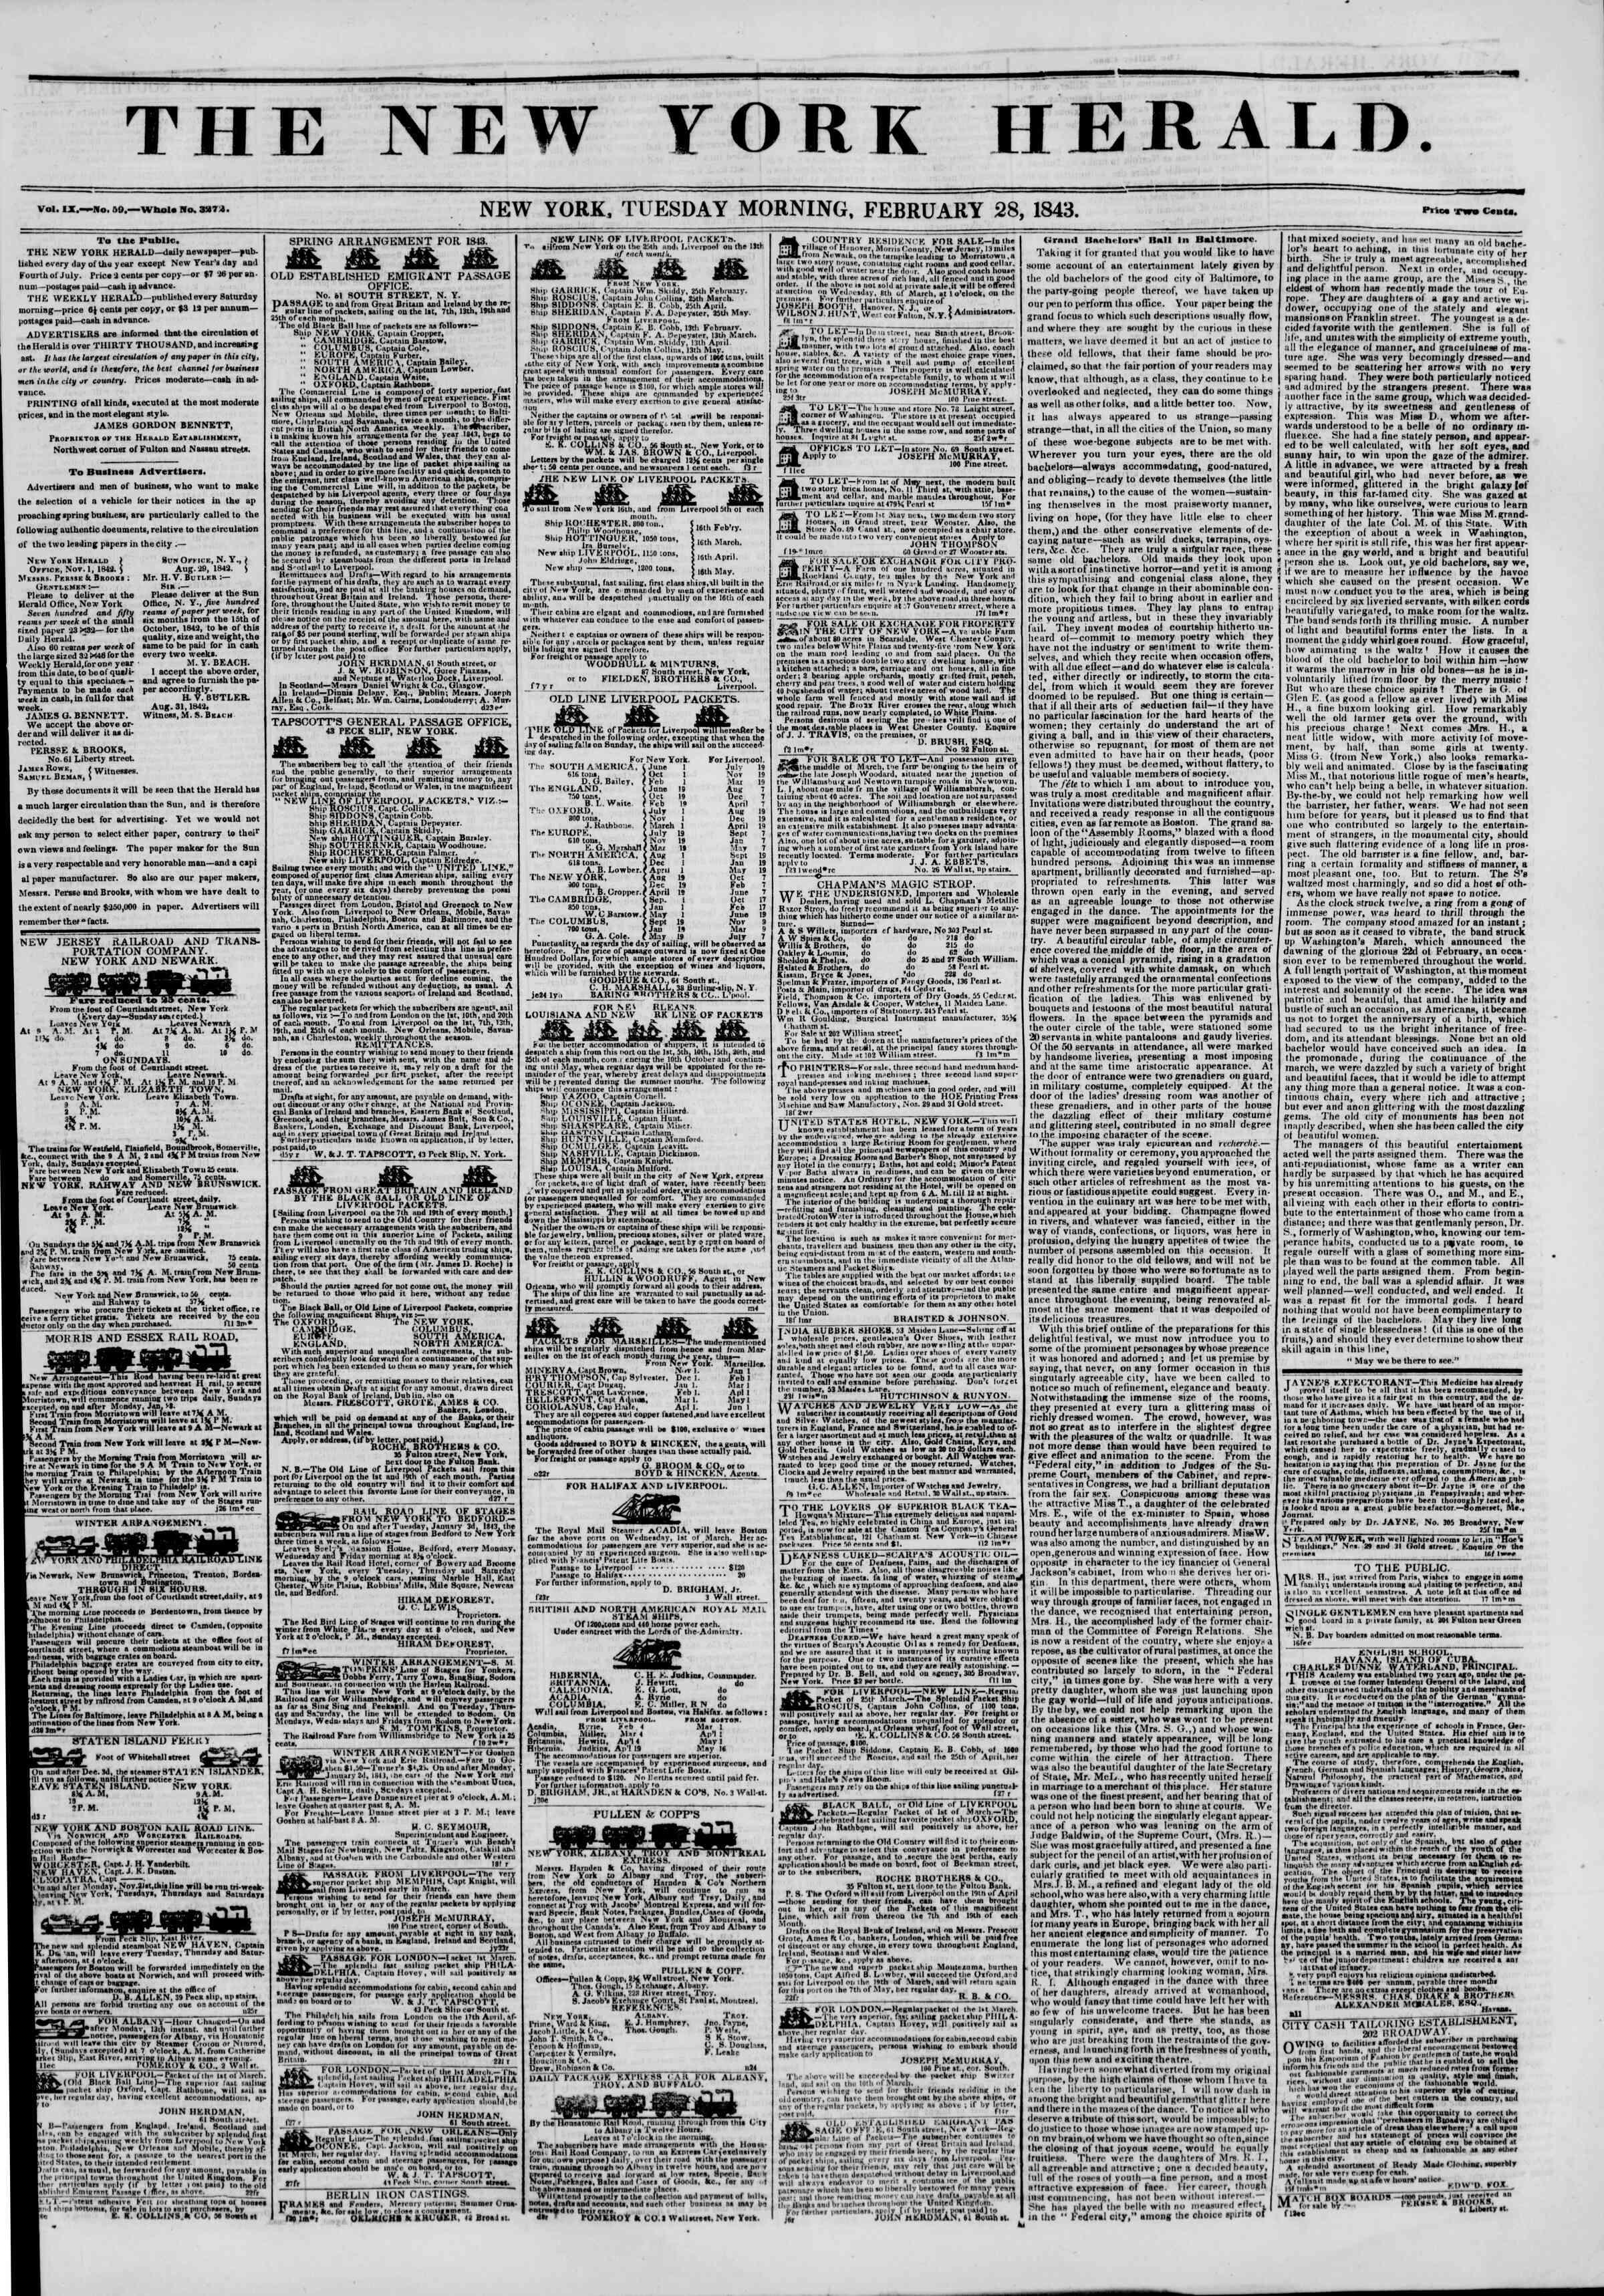 February 28, 1843 Tarihli The New York Herald Gazetesi Sayfa 1